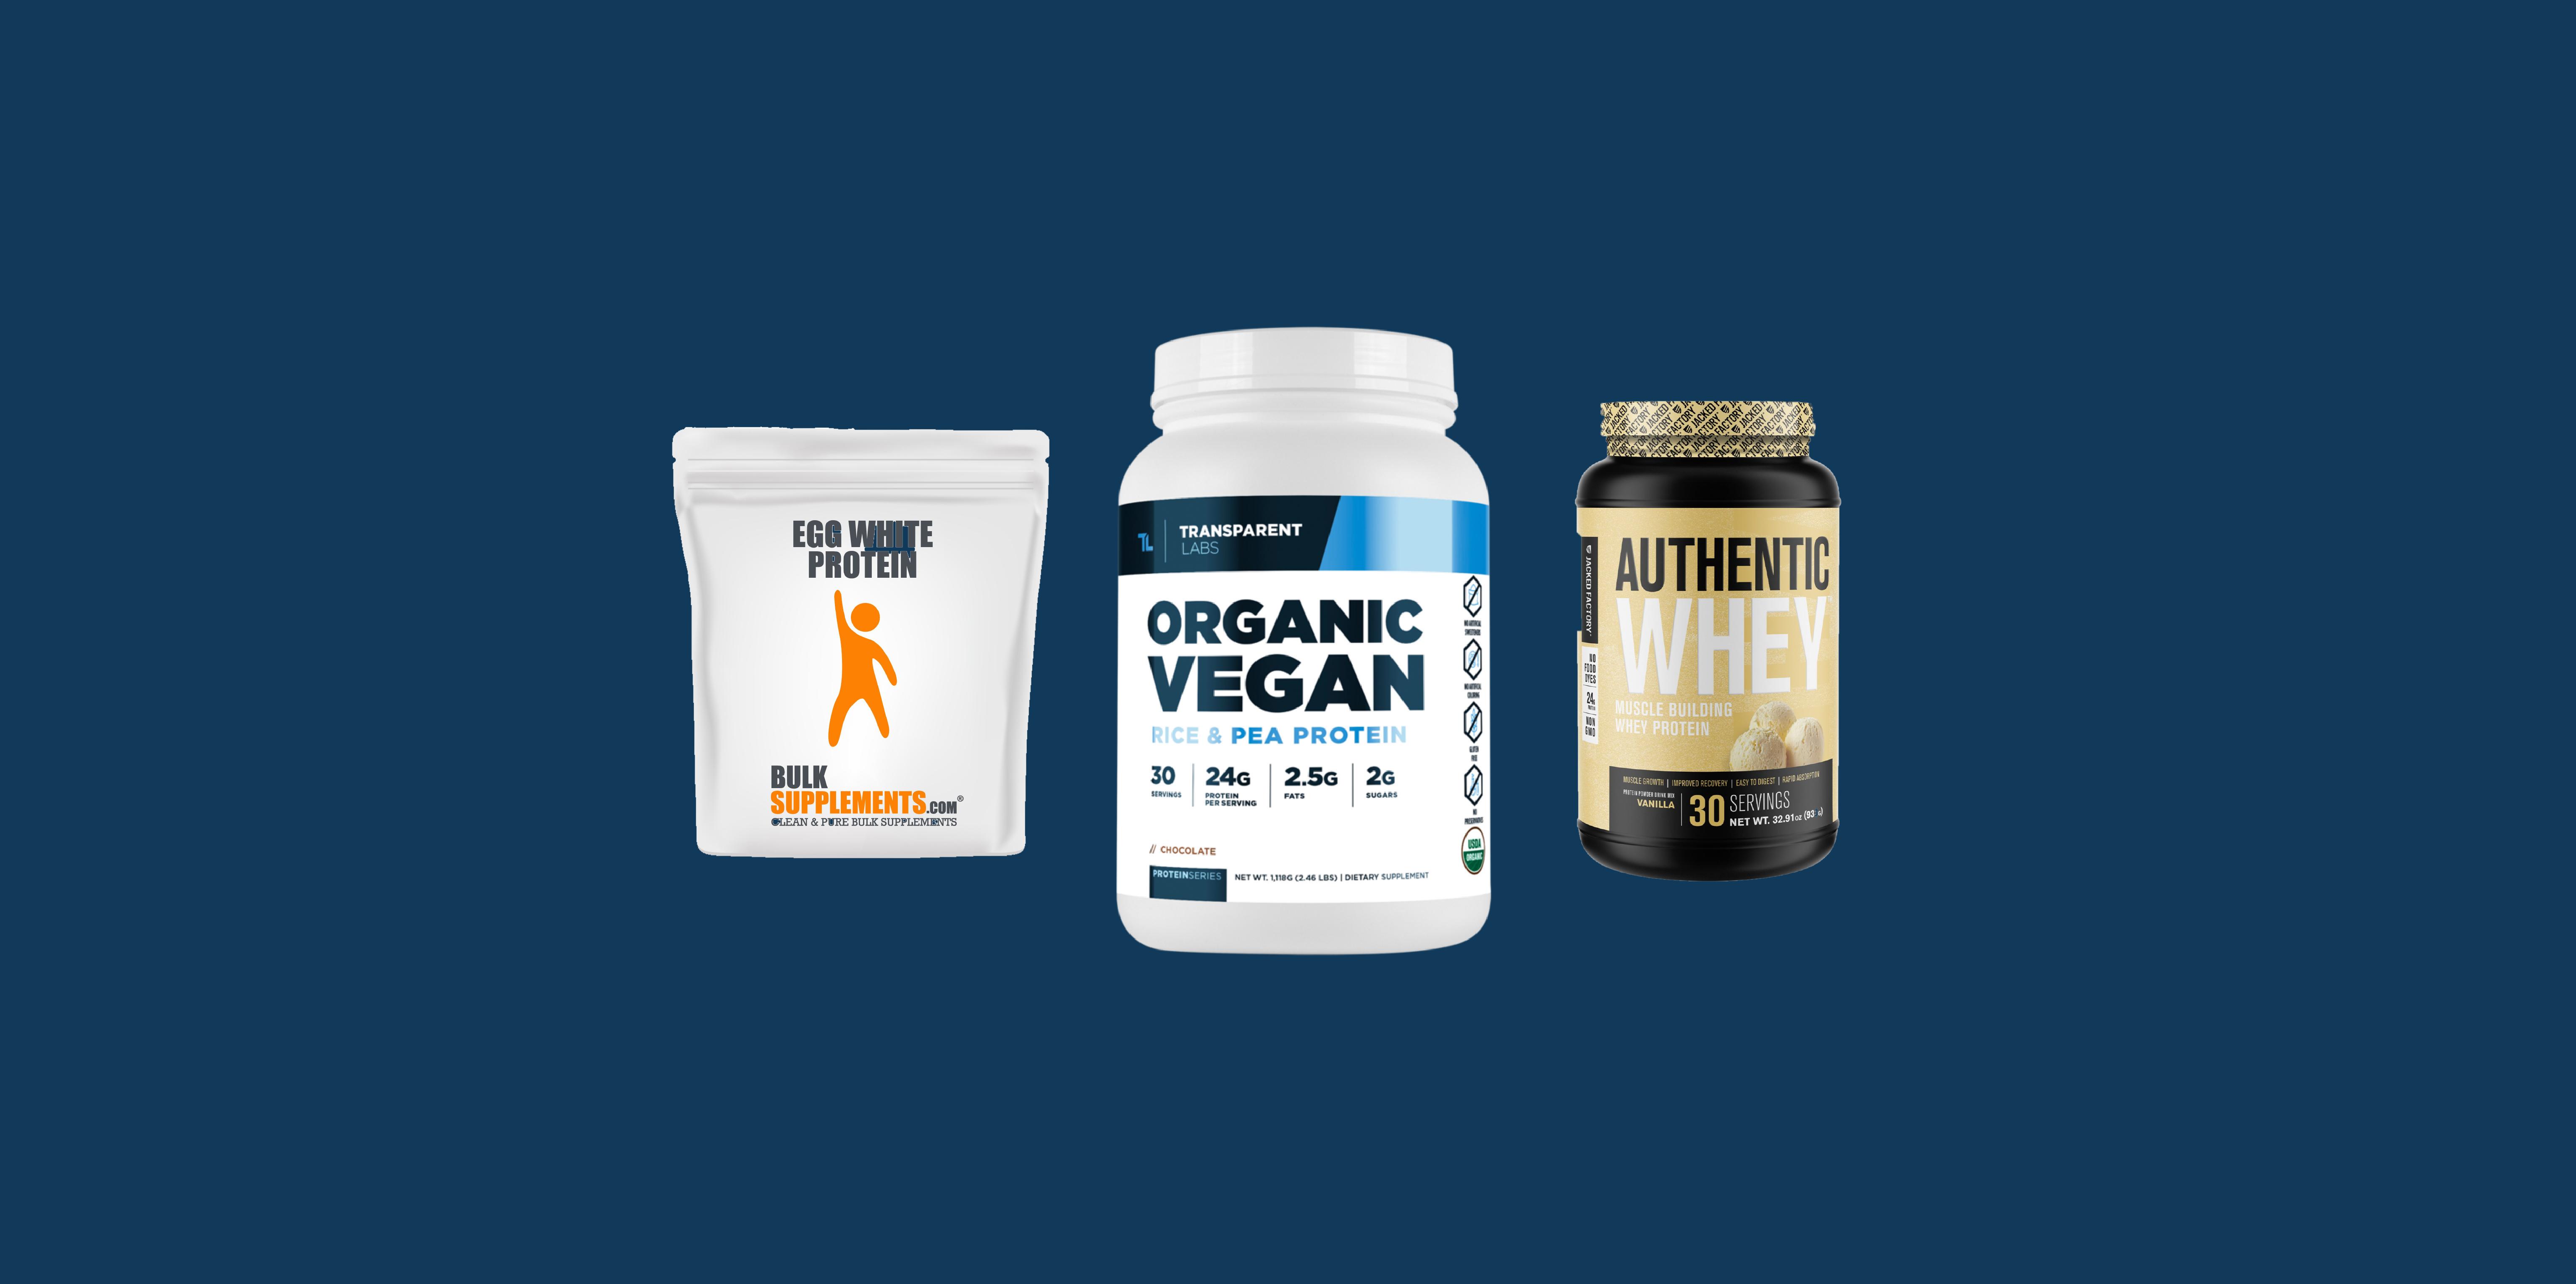 Best Soy Free Protein Powder